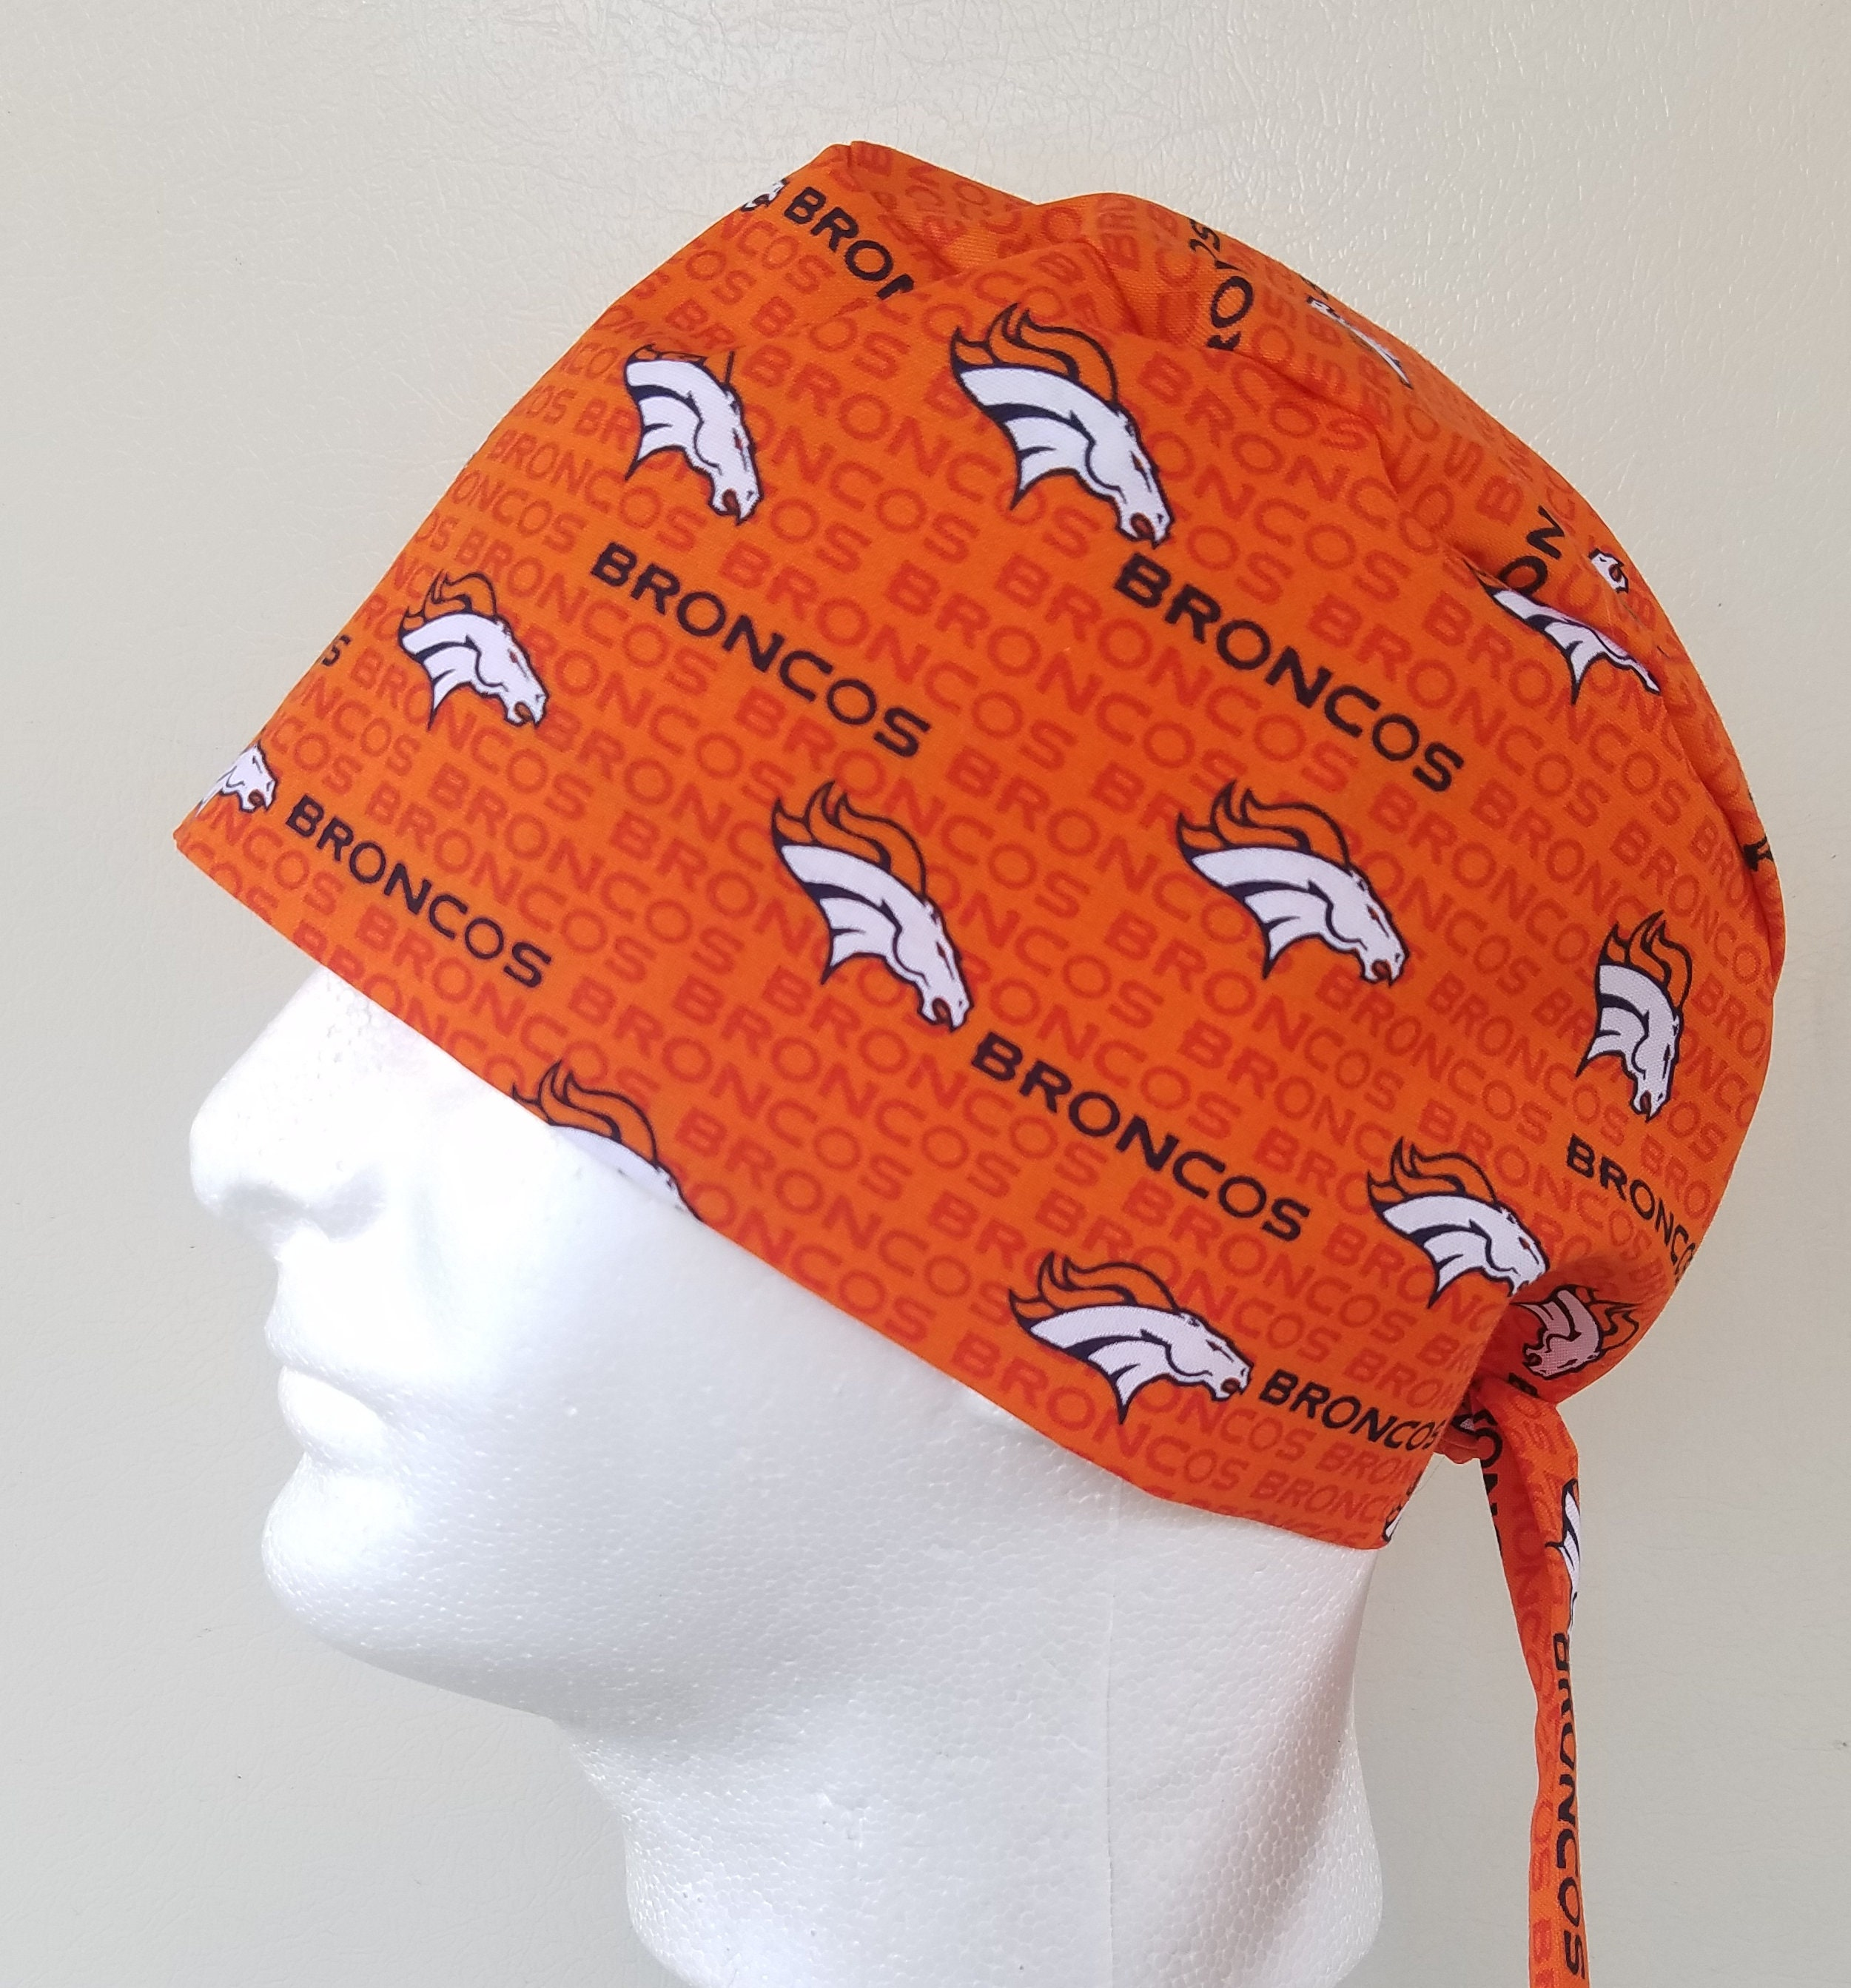 0750188ed Denver Broncos scrub hat, Mens surgical tie back scrub hat, scrub ...